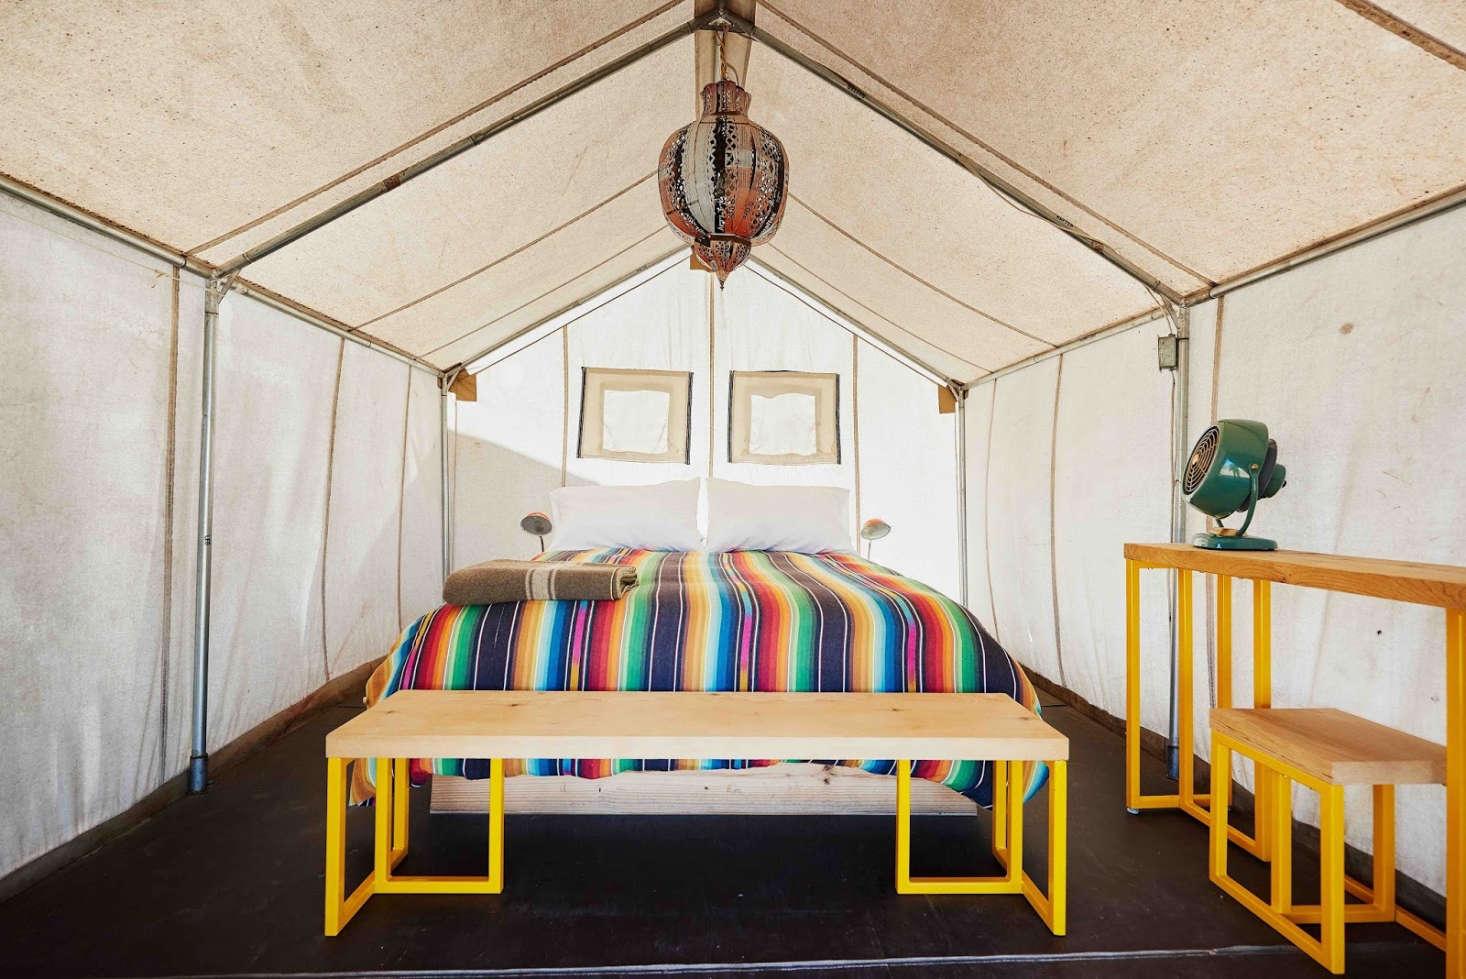 Steal This Look: Tent Bedroom at El Cosmico in Marfa, Texas